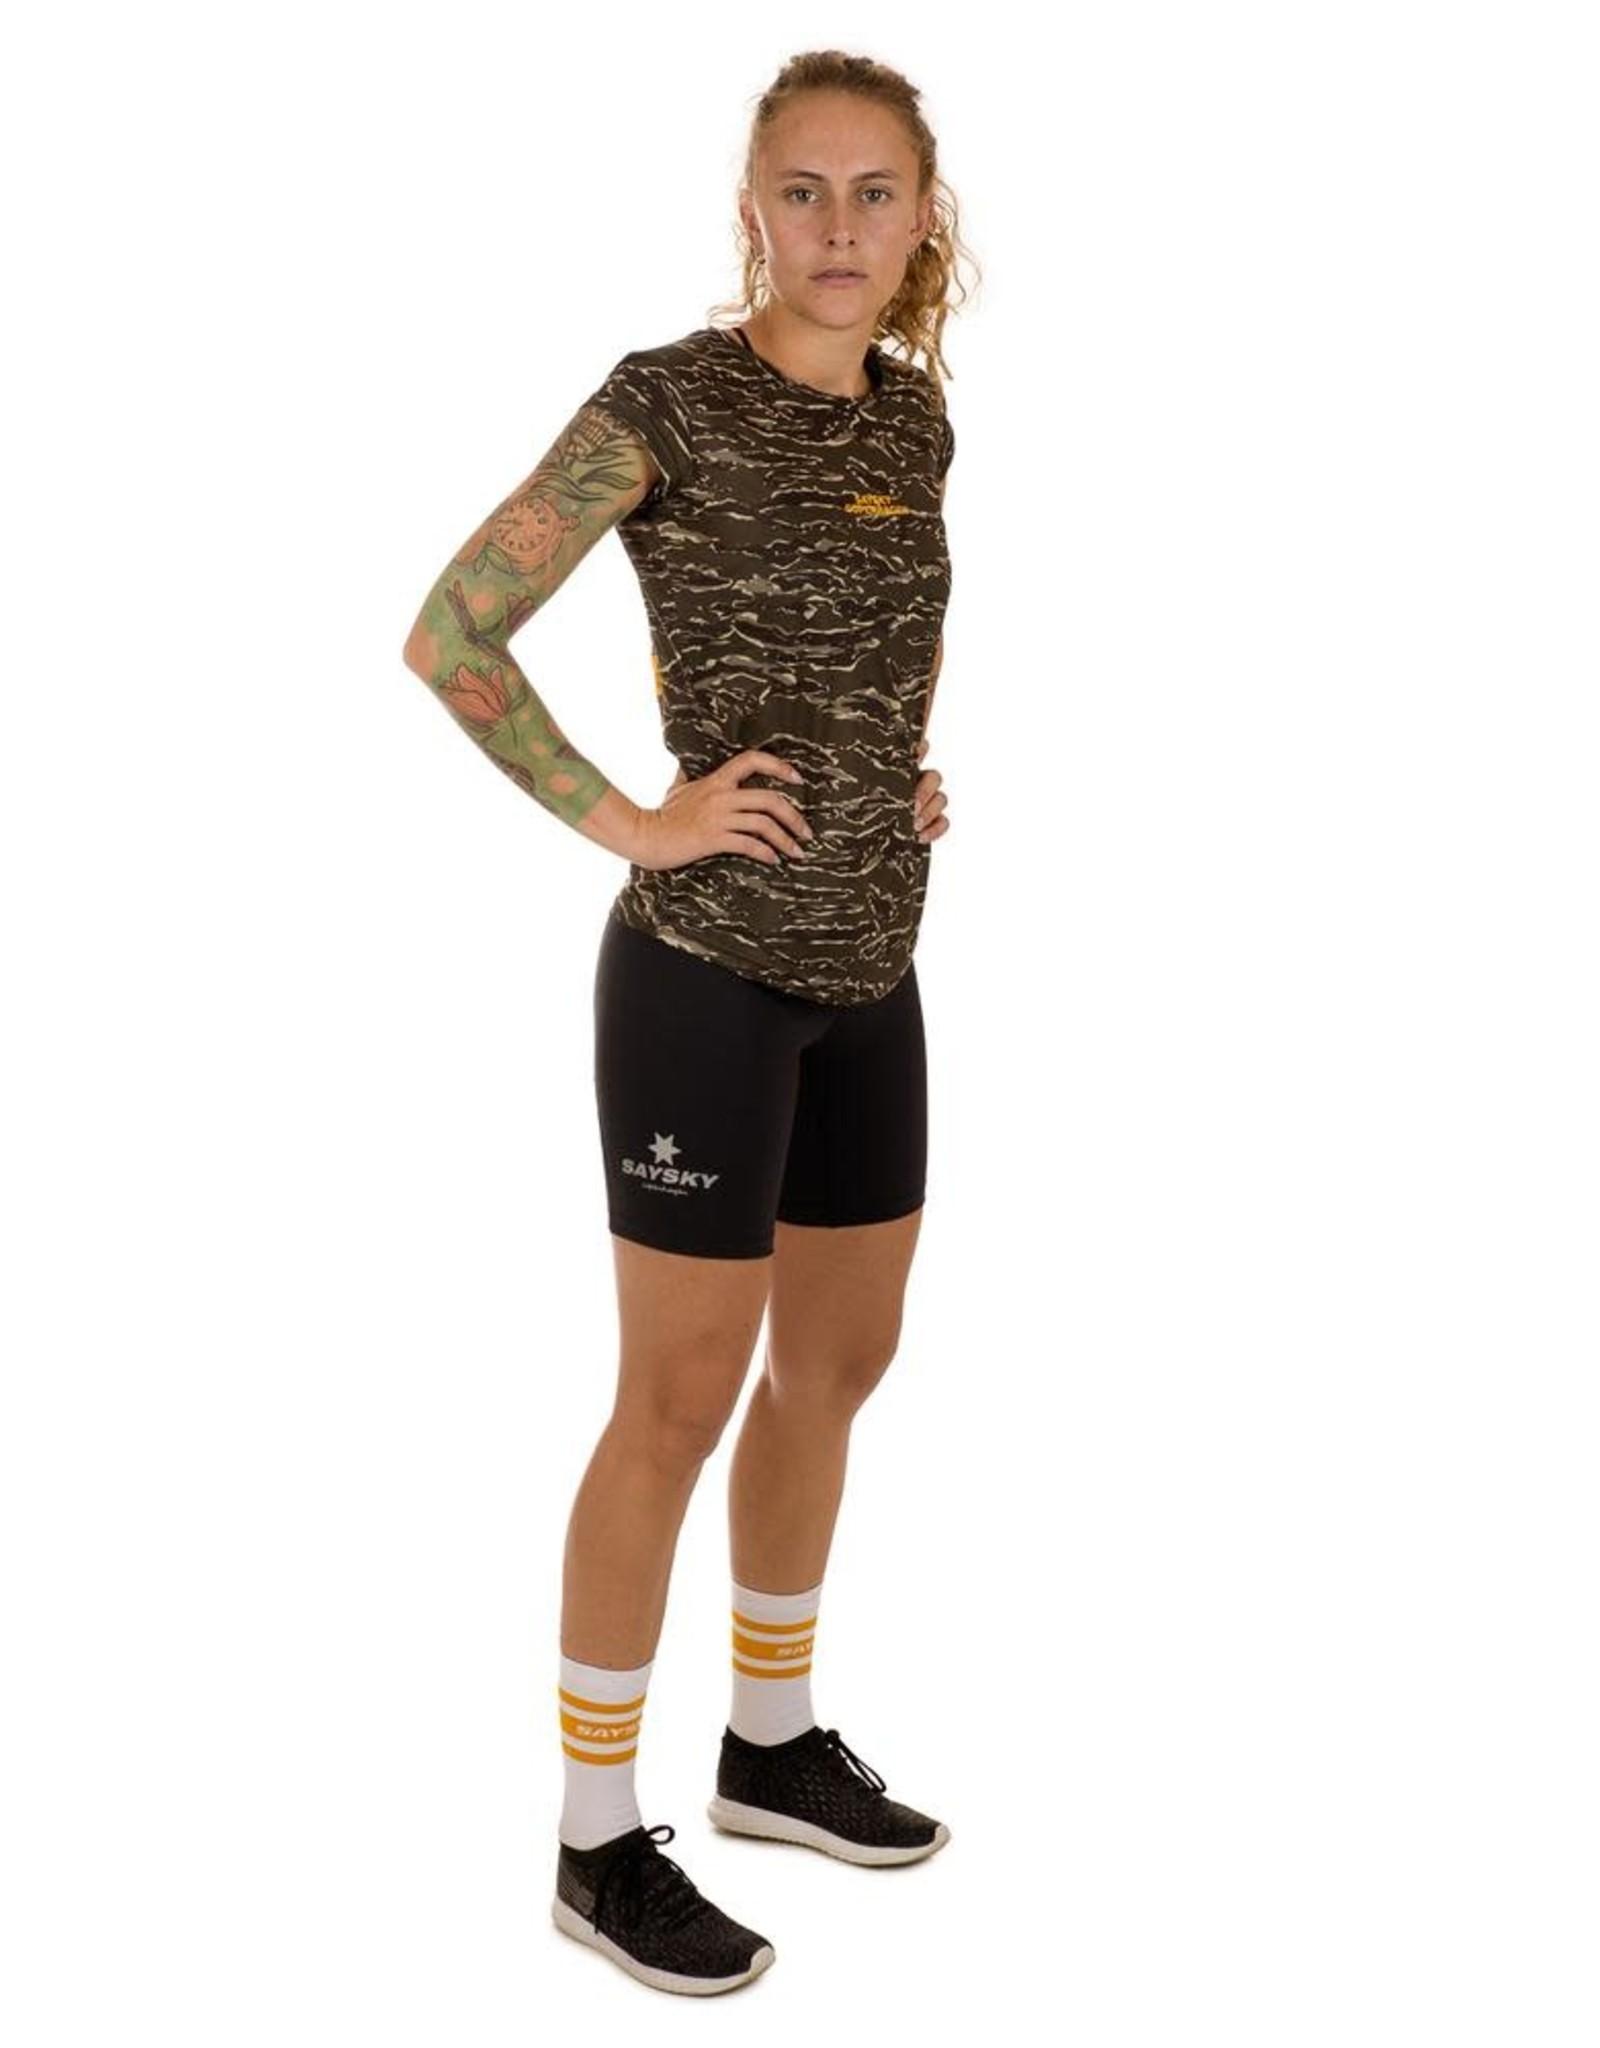 Saysky CGRST01 Electra 2.0 shorts